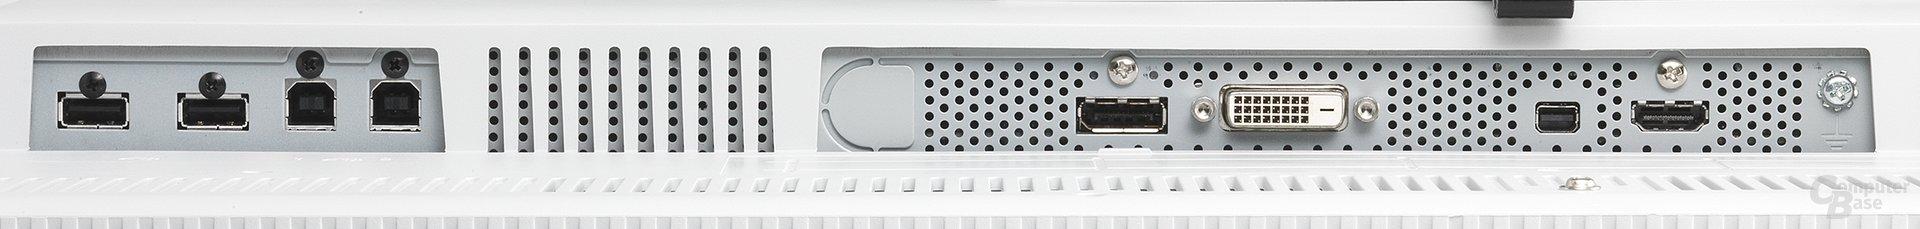 NEC MultiSync PA302W